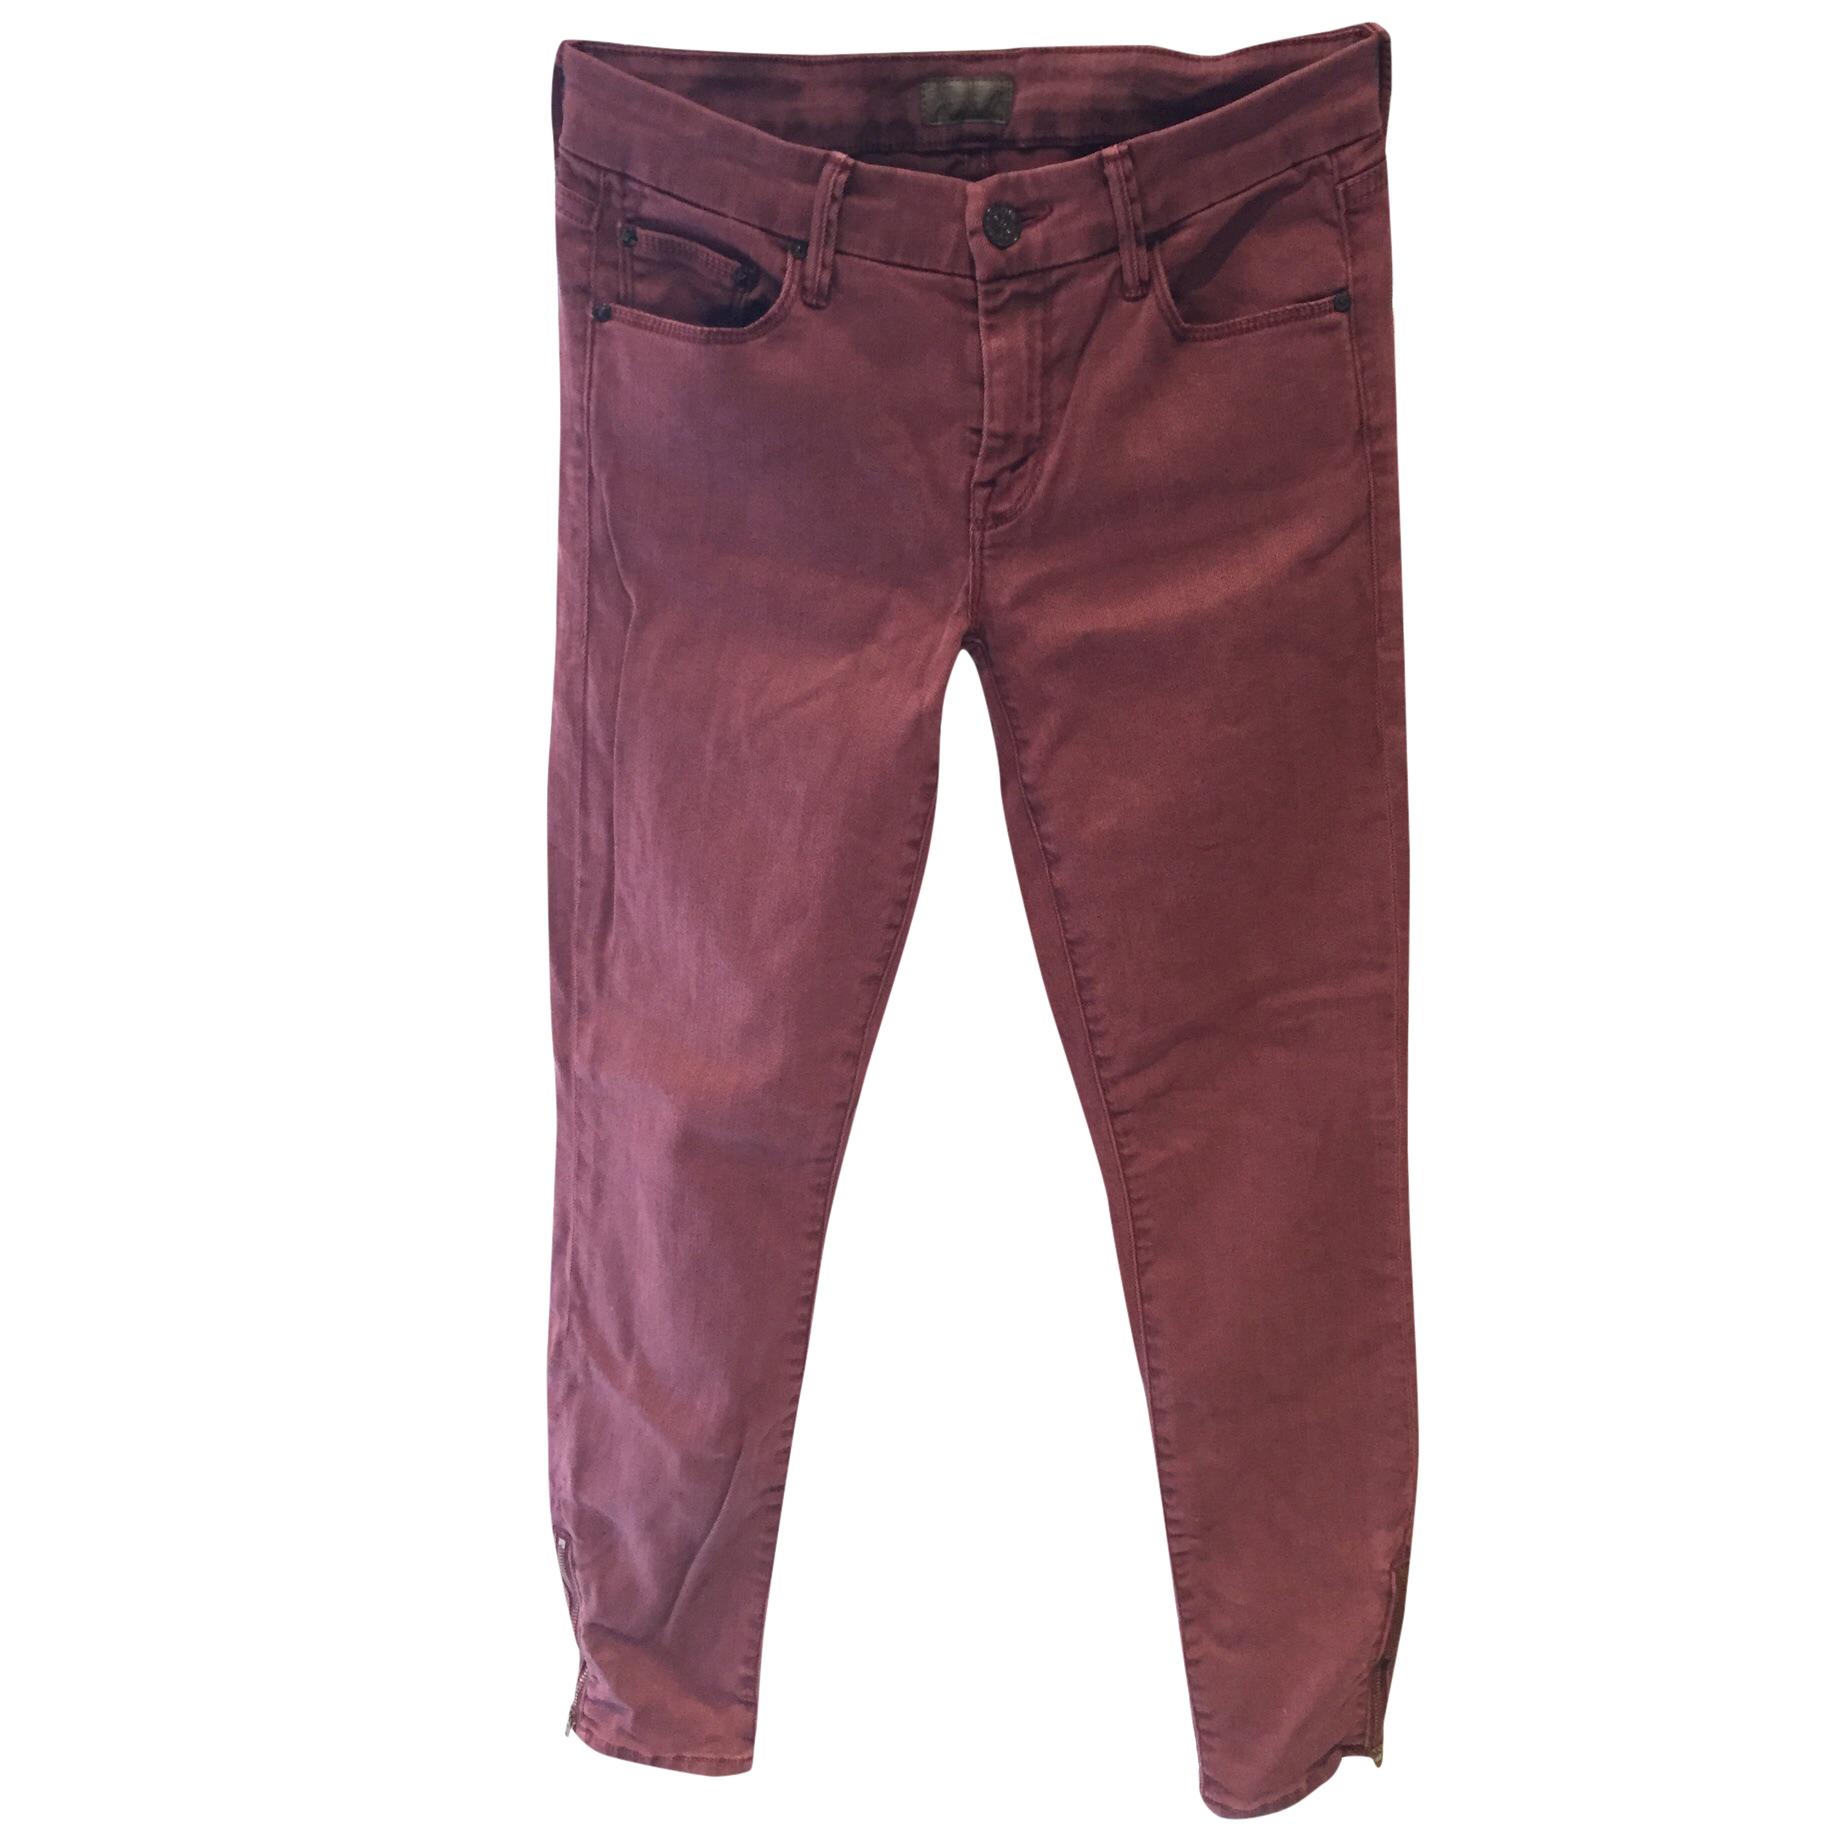 Mother denim burgundy jeans